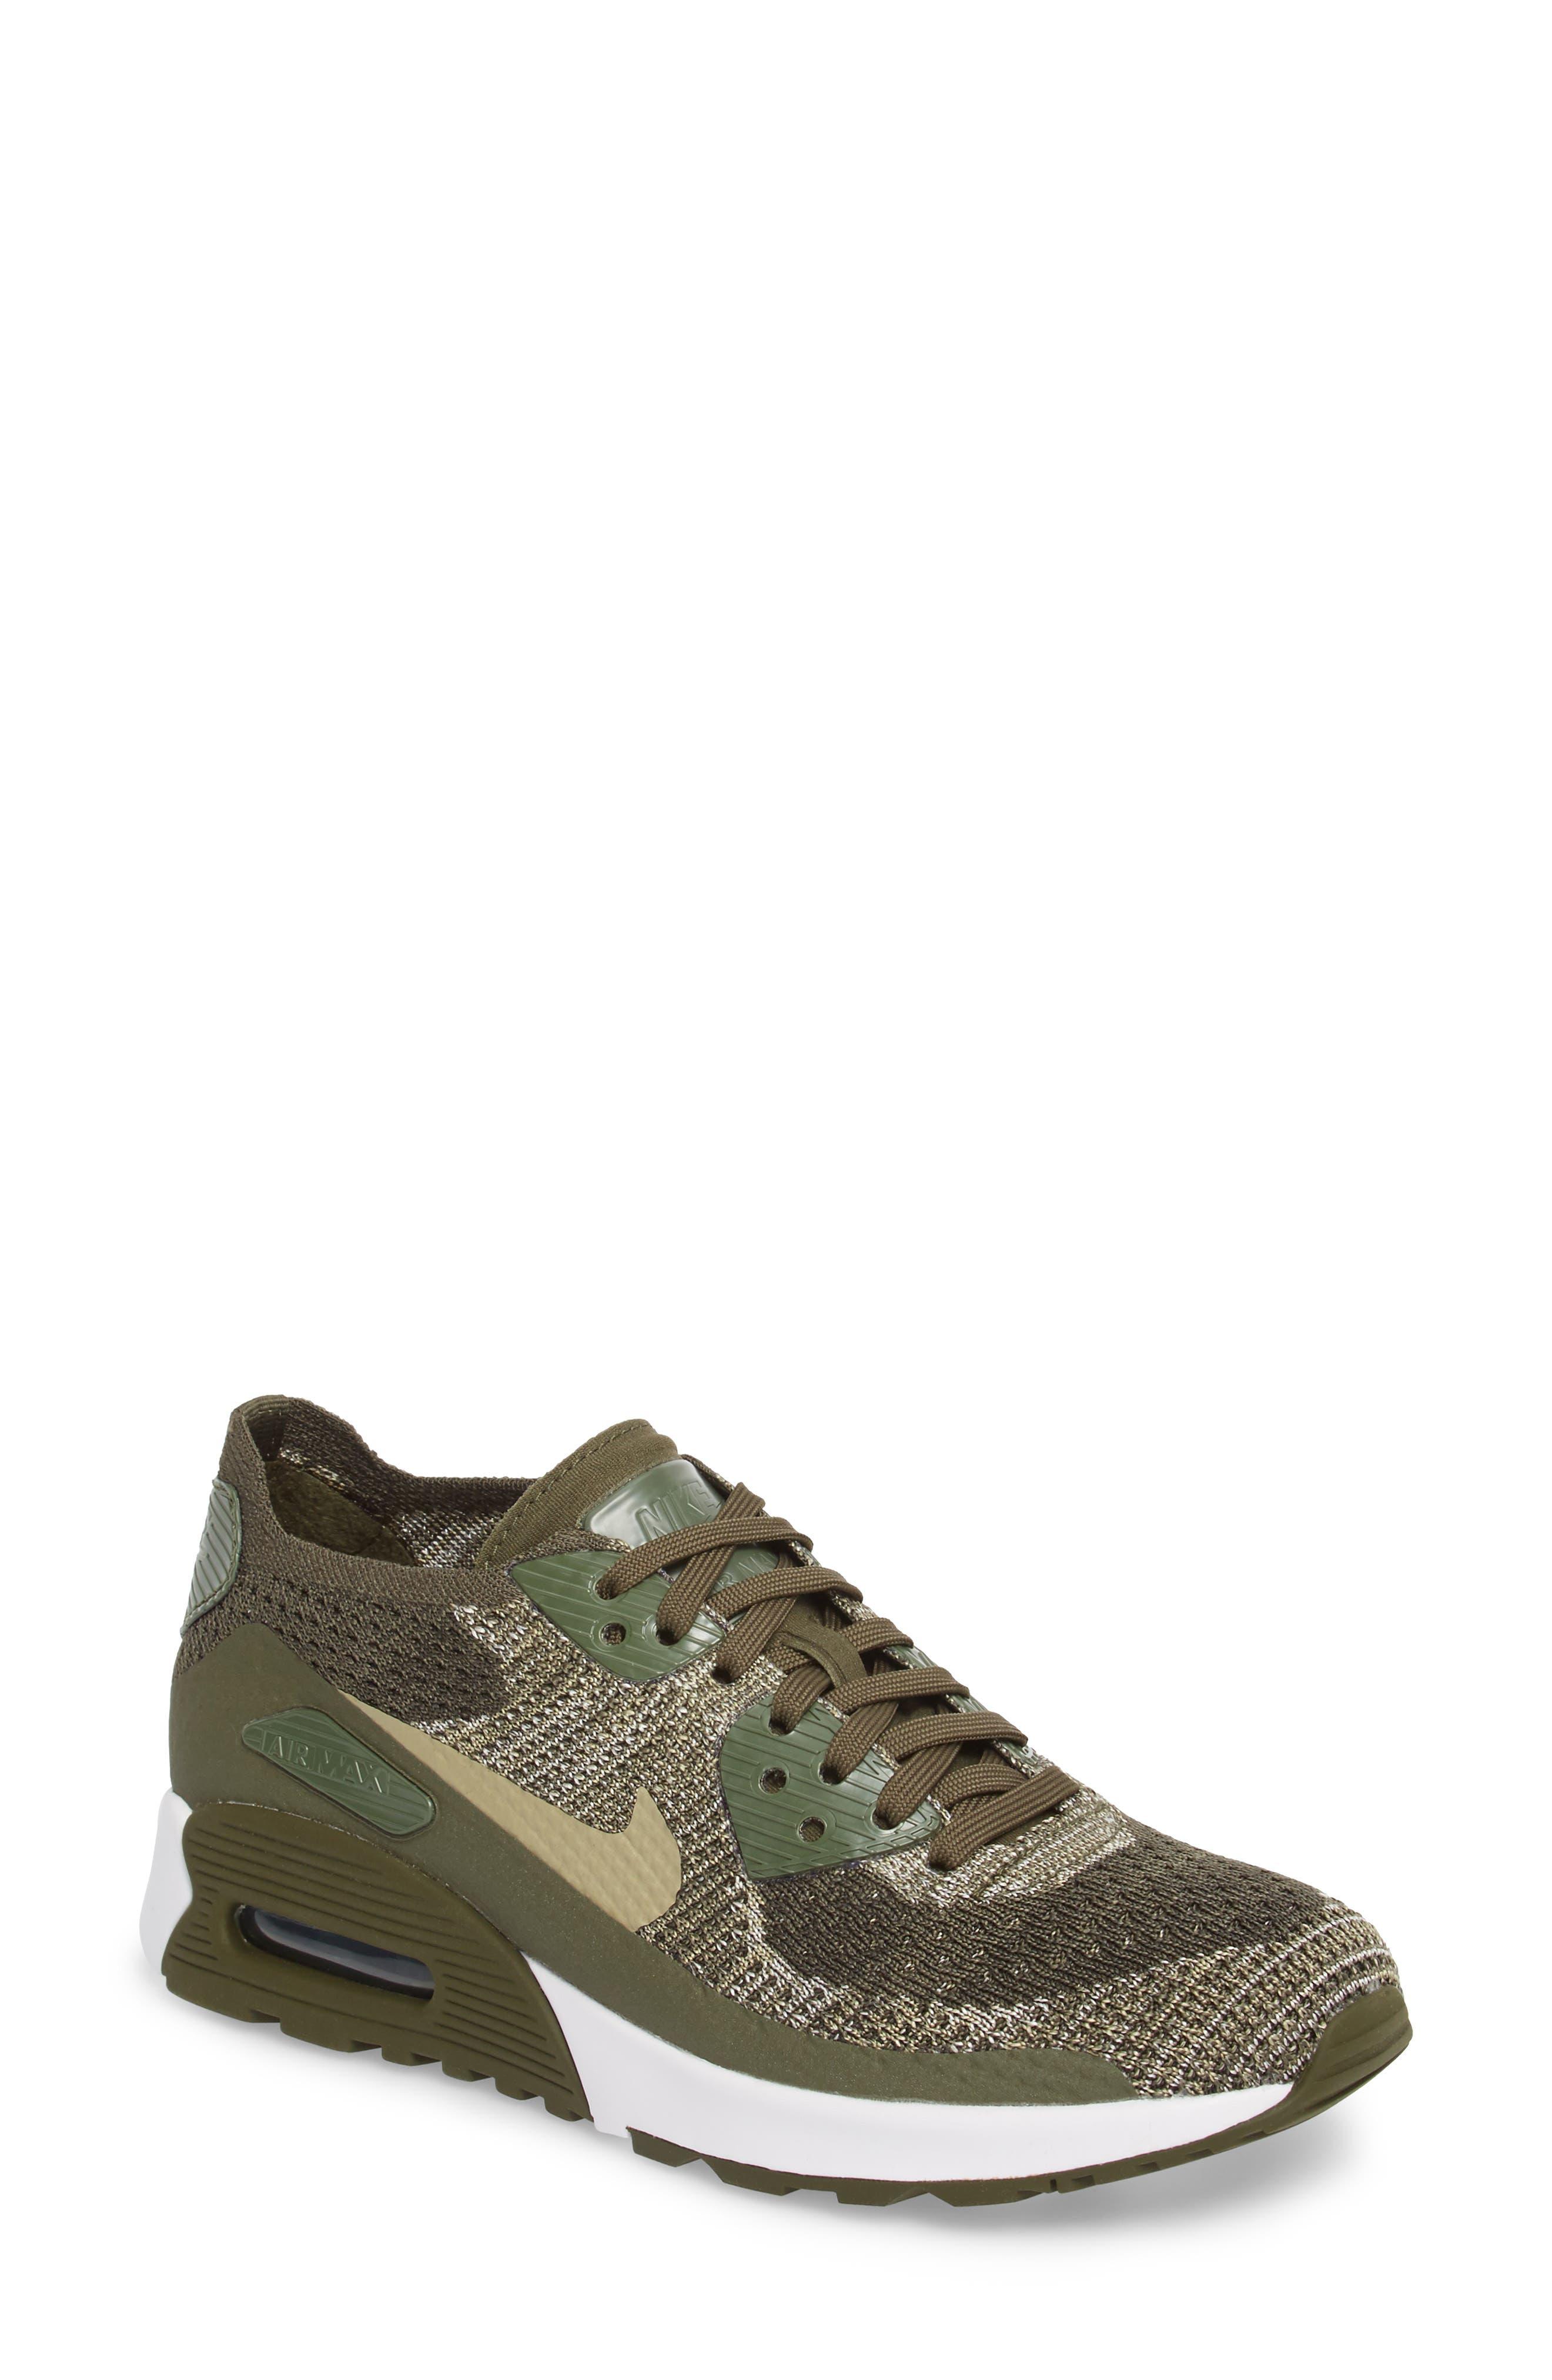 Air Max 90 Flyknit Ultra 2.0 Sneaker,                             Main thumbnail 1, color,                             Cargo Khaki/ Neutral Olive